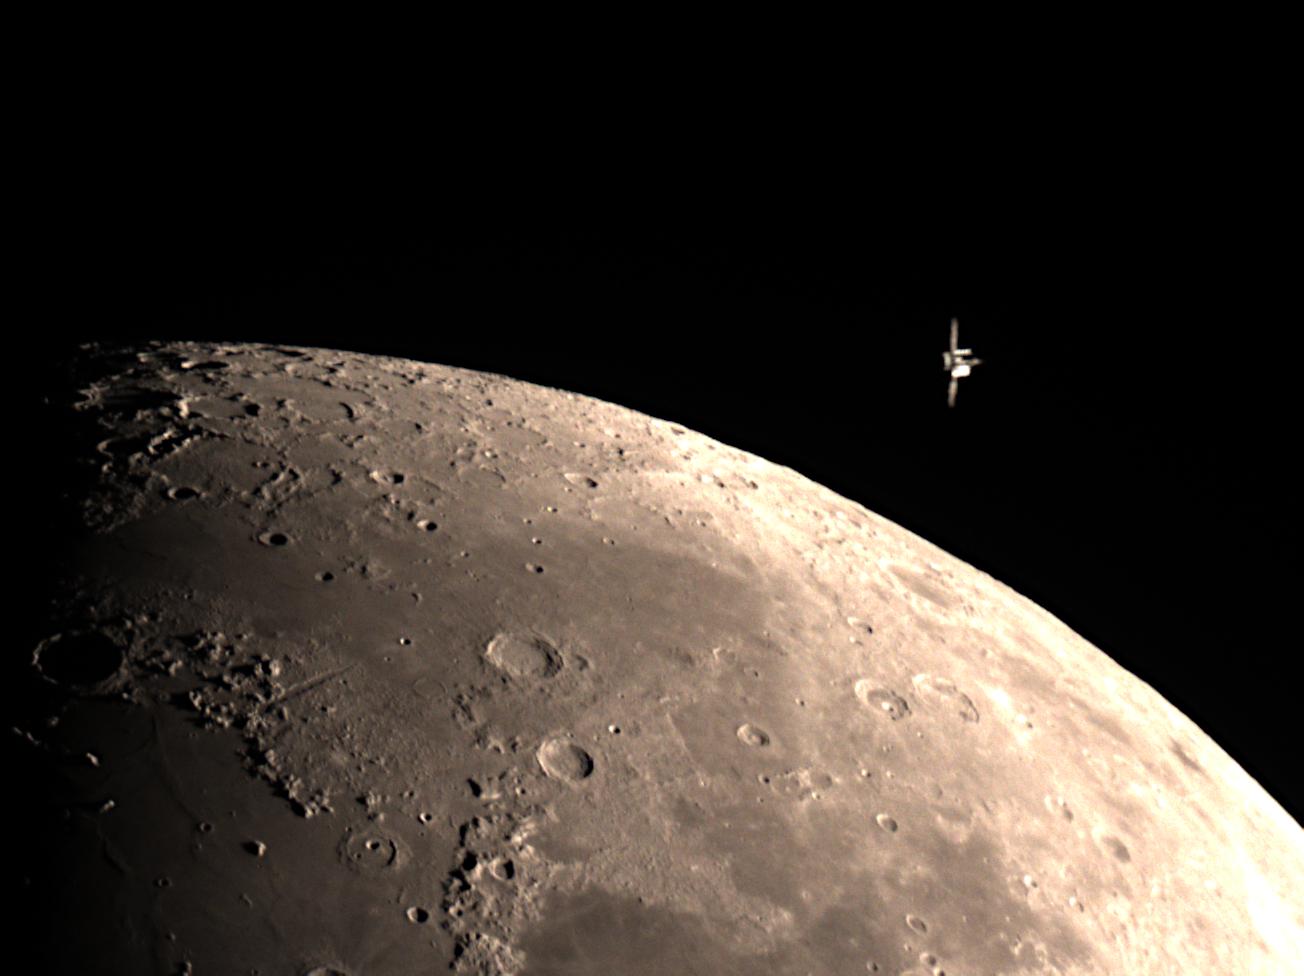 ISS_Moon_210216_010420_f050_gimp.jpg